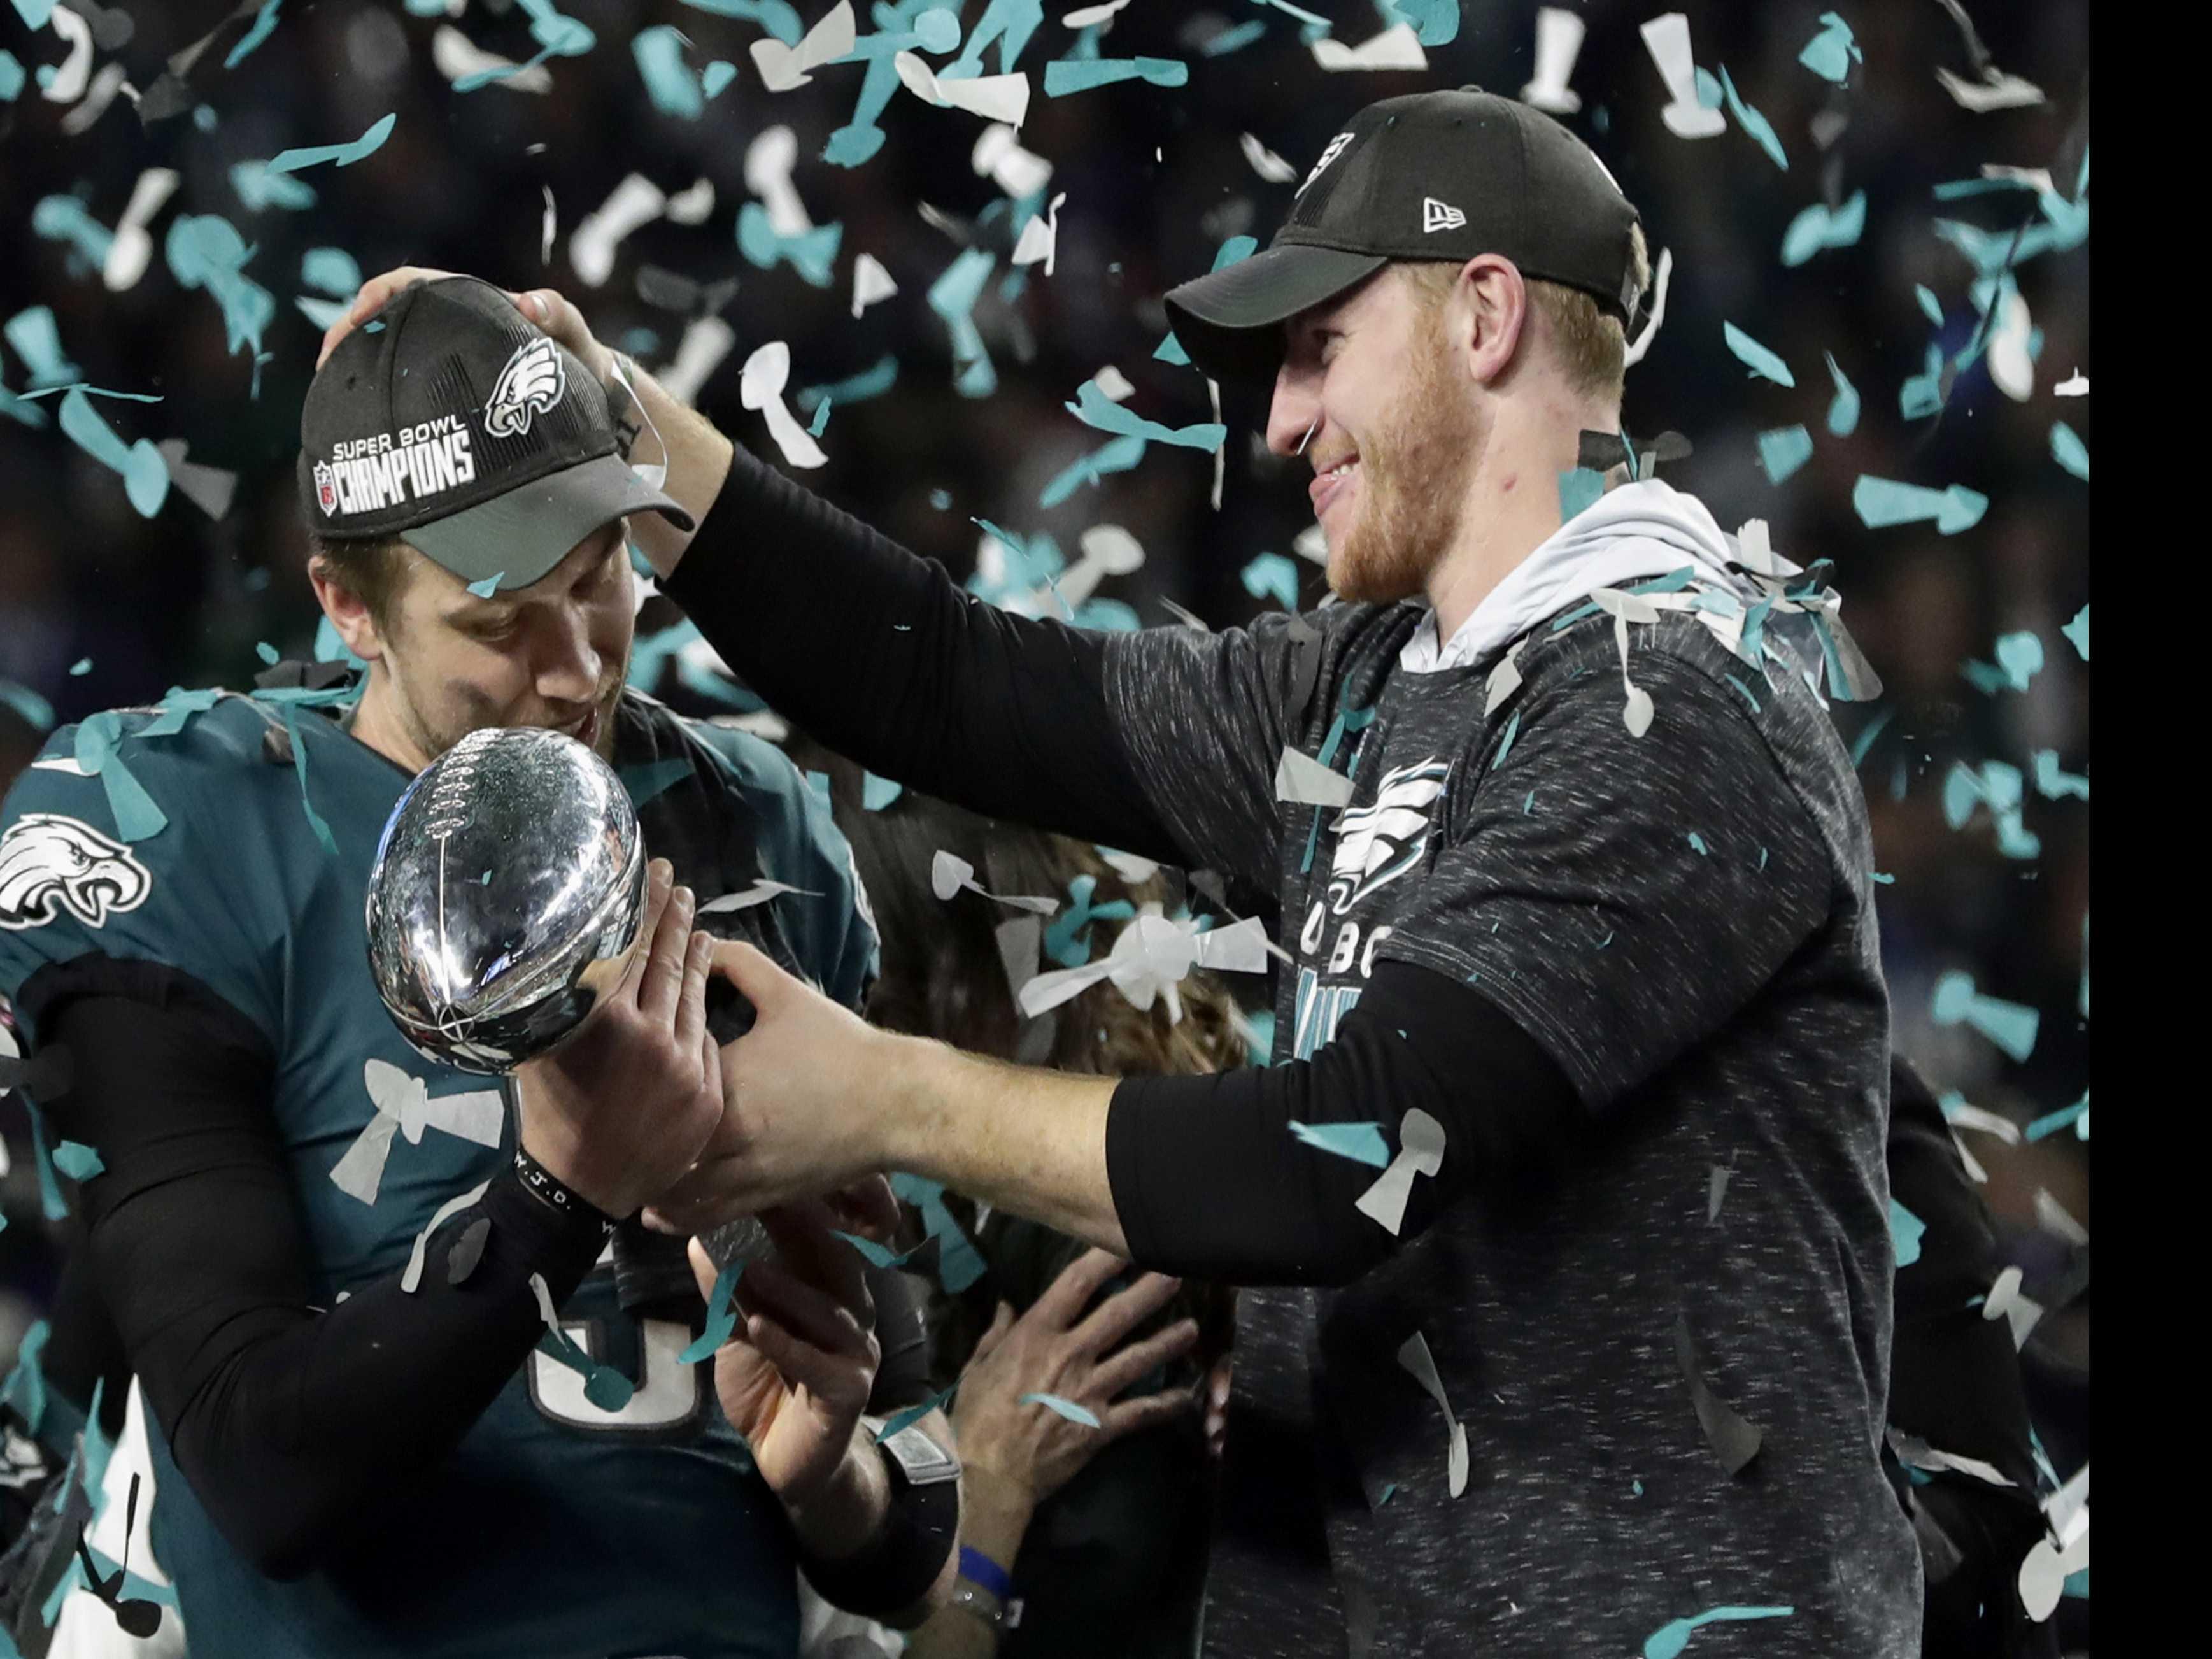 Trump Calls Off Event for NFL's Eagles, Cites Anthem Dispute